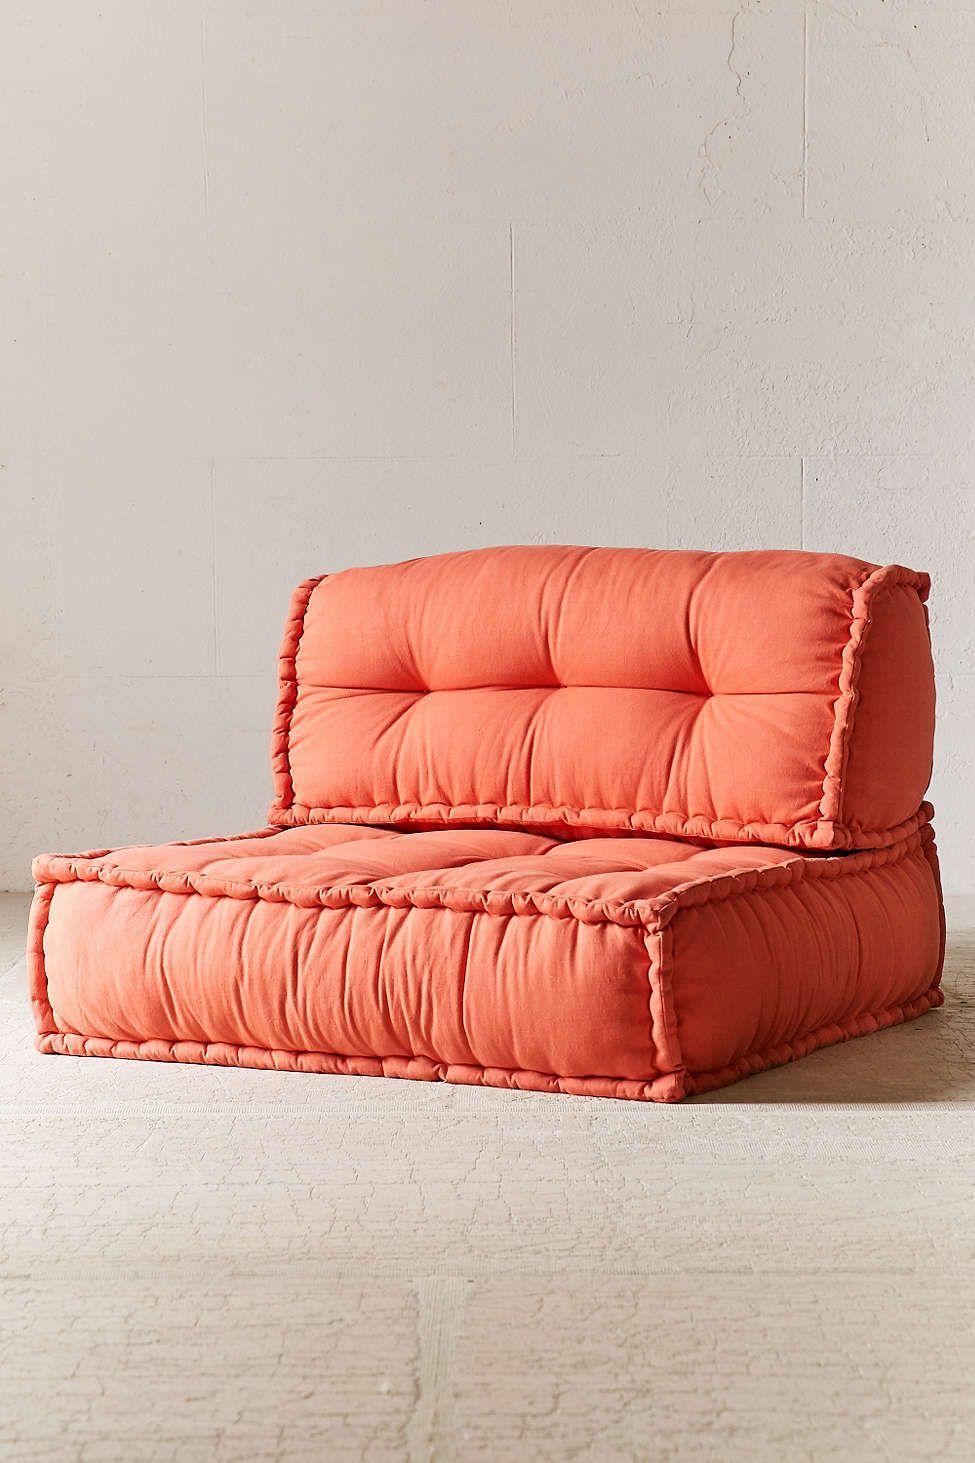 Reema Floor Cushion in 2020 Reema floor cushion, Floor